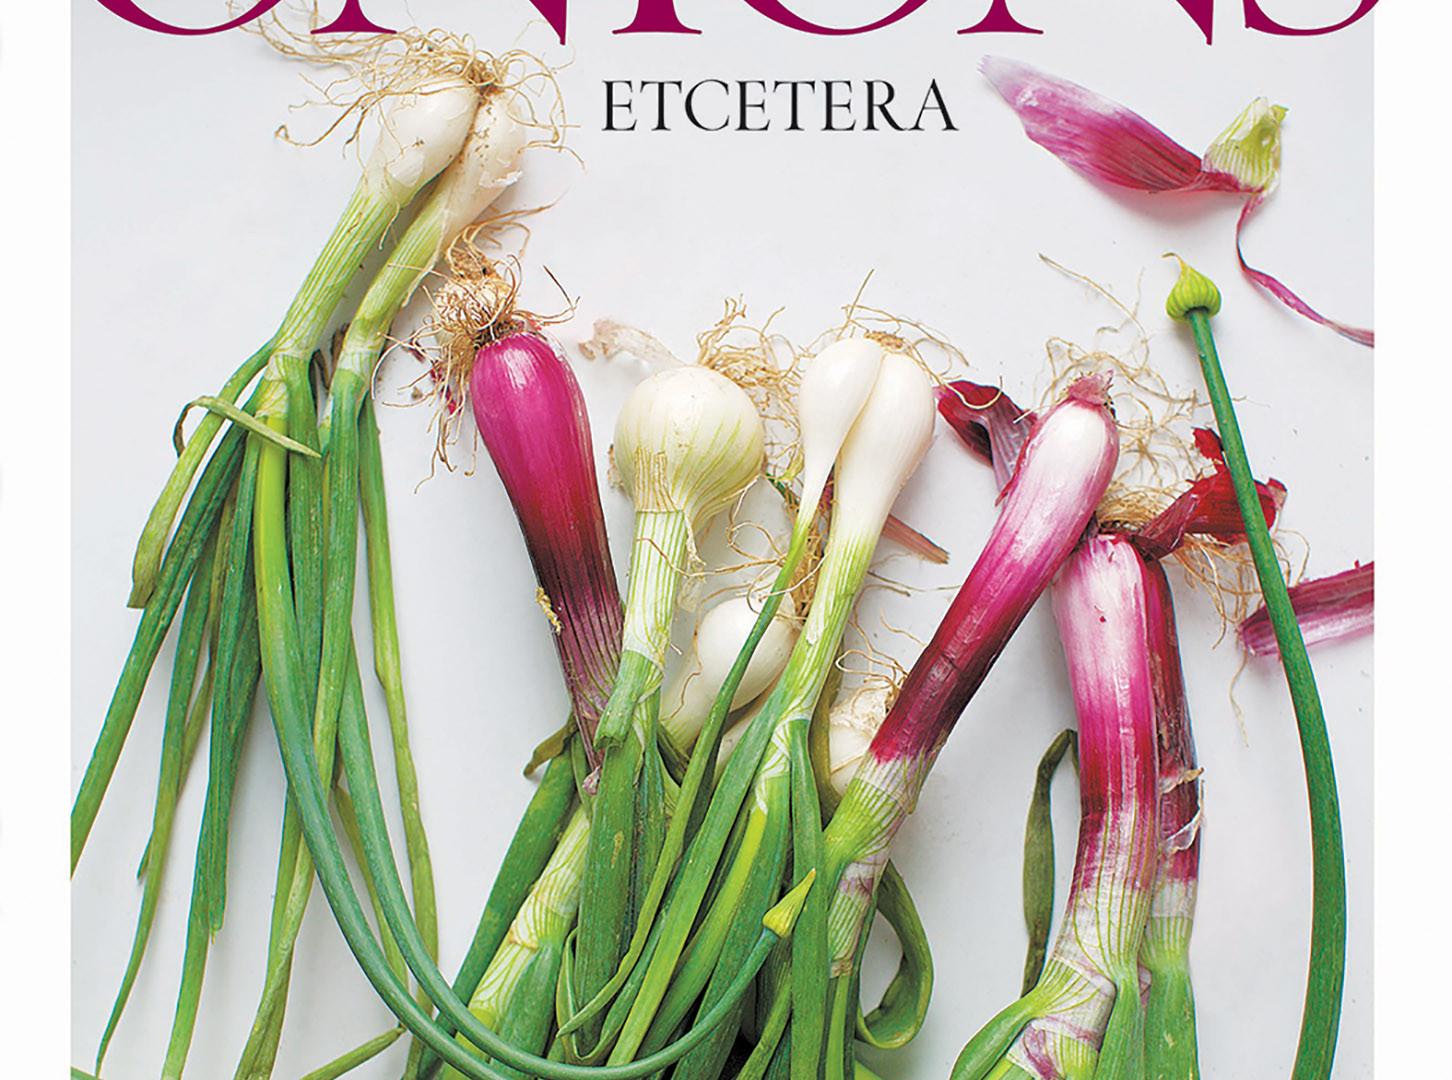 R&C Onions-etcetera.jpg